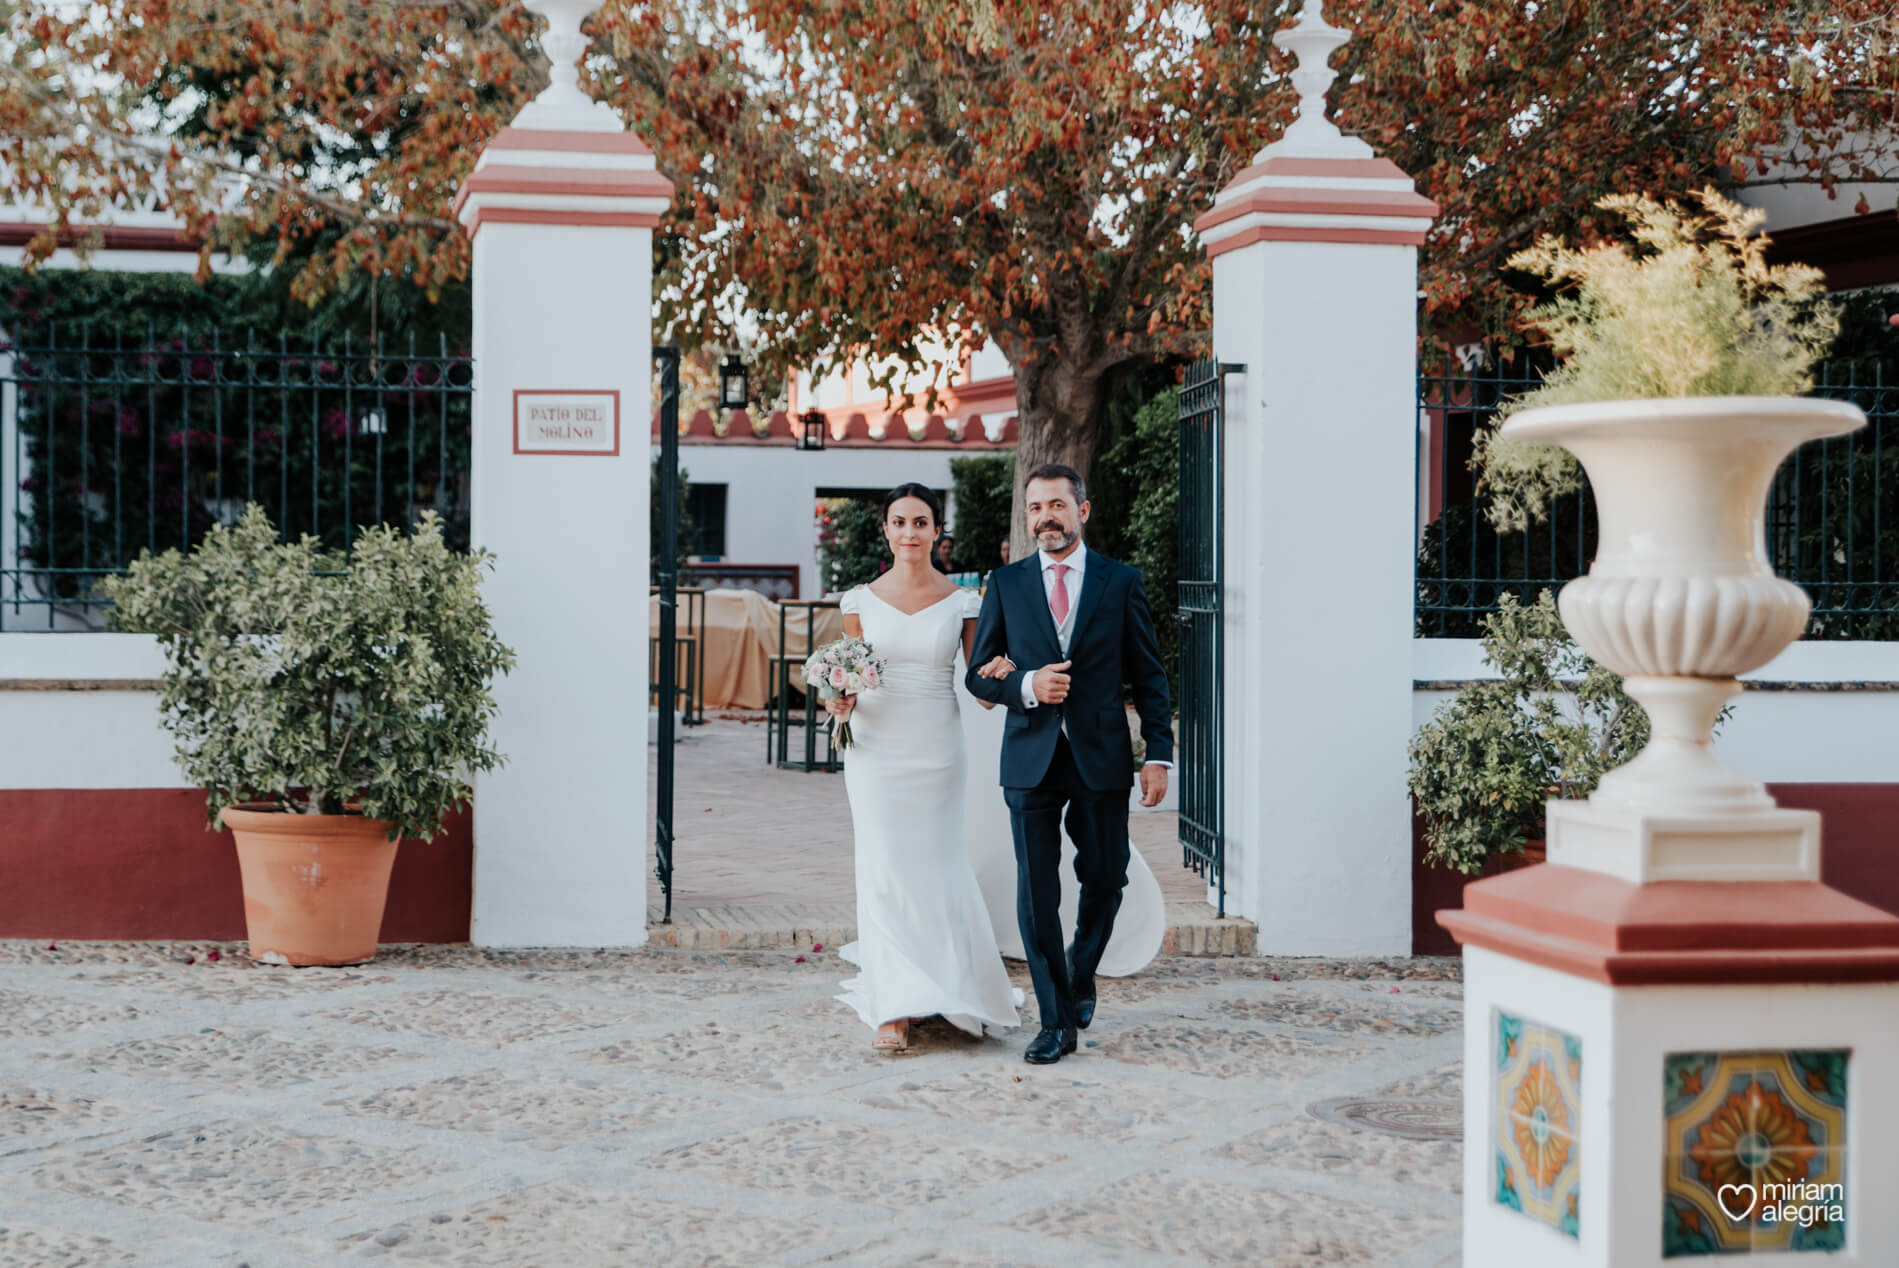 boda-en-sevilla-miriam-alegria-62